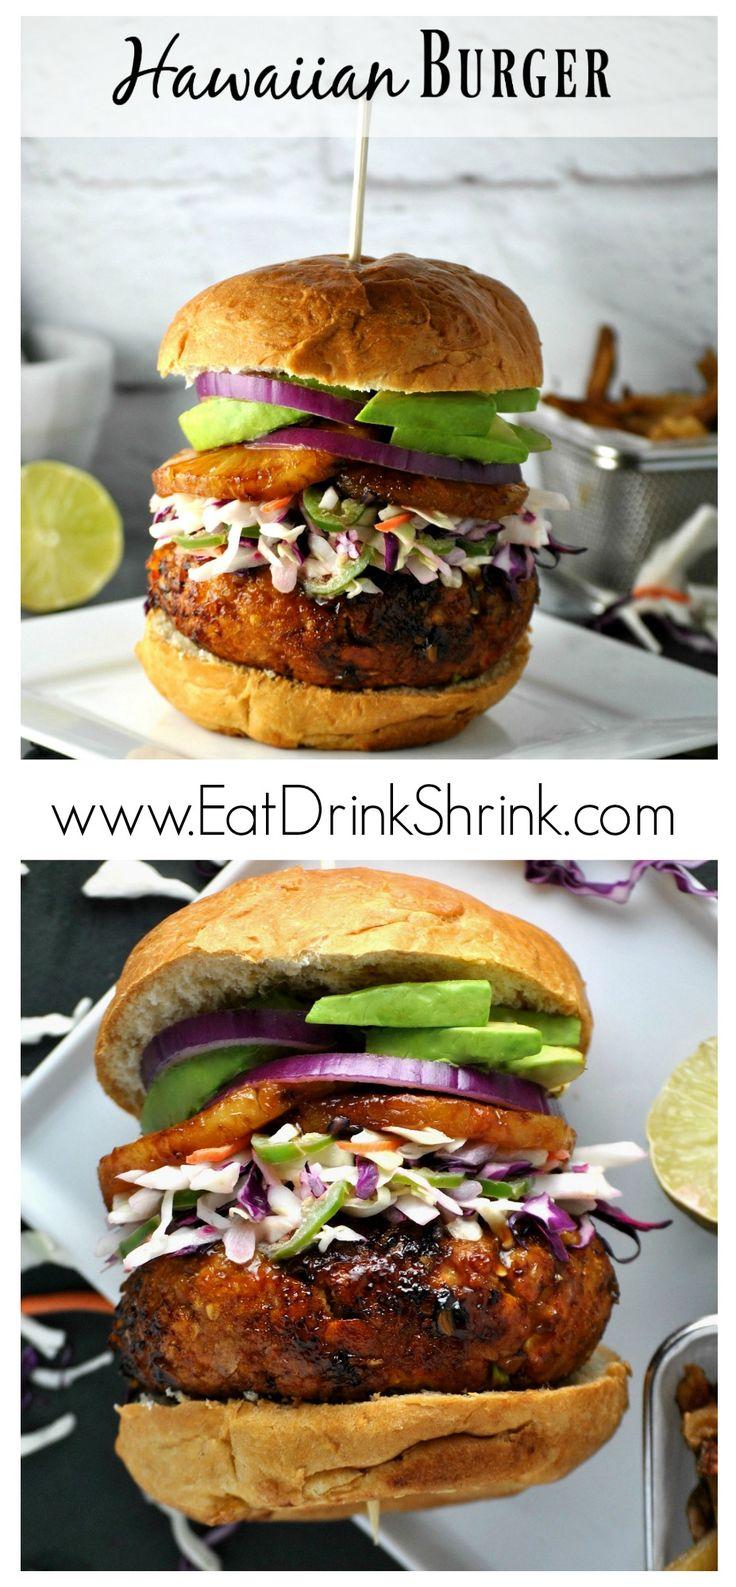 Vegan Hawaiian Burger with homemade teriyaki marinade and Jalapeño Slaw